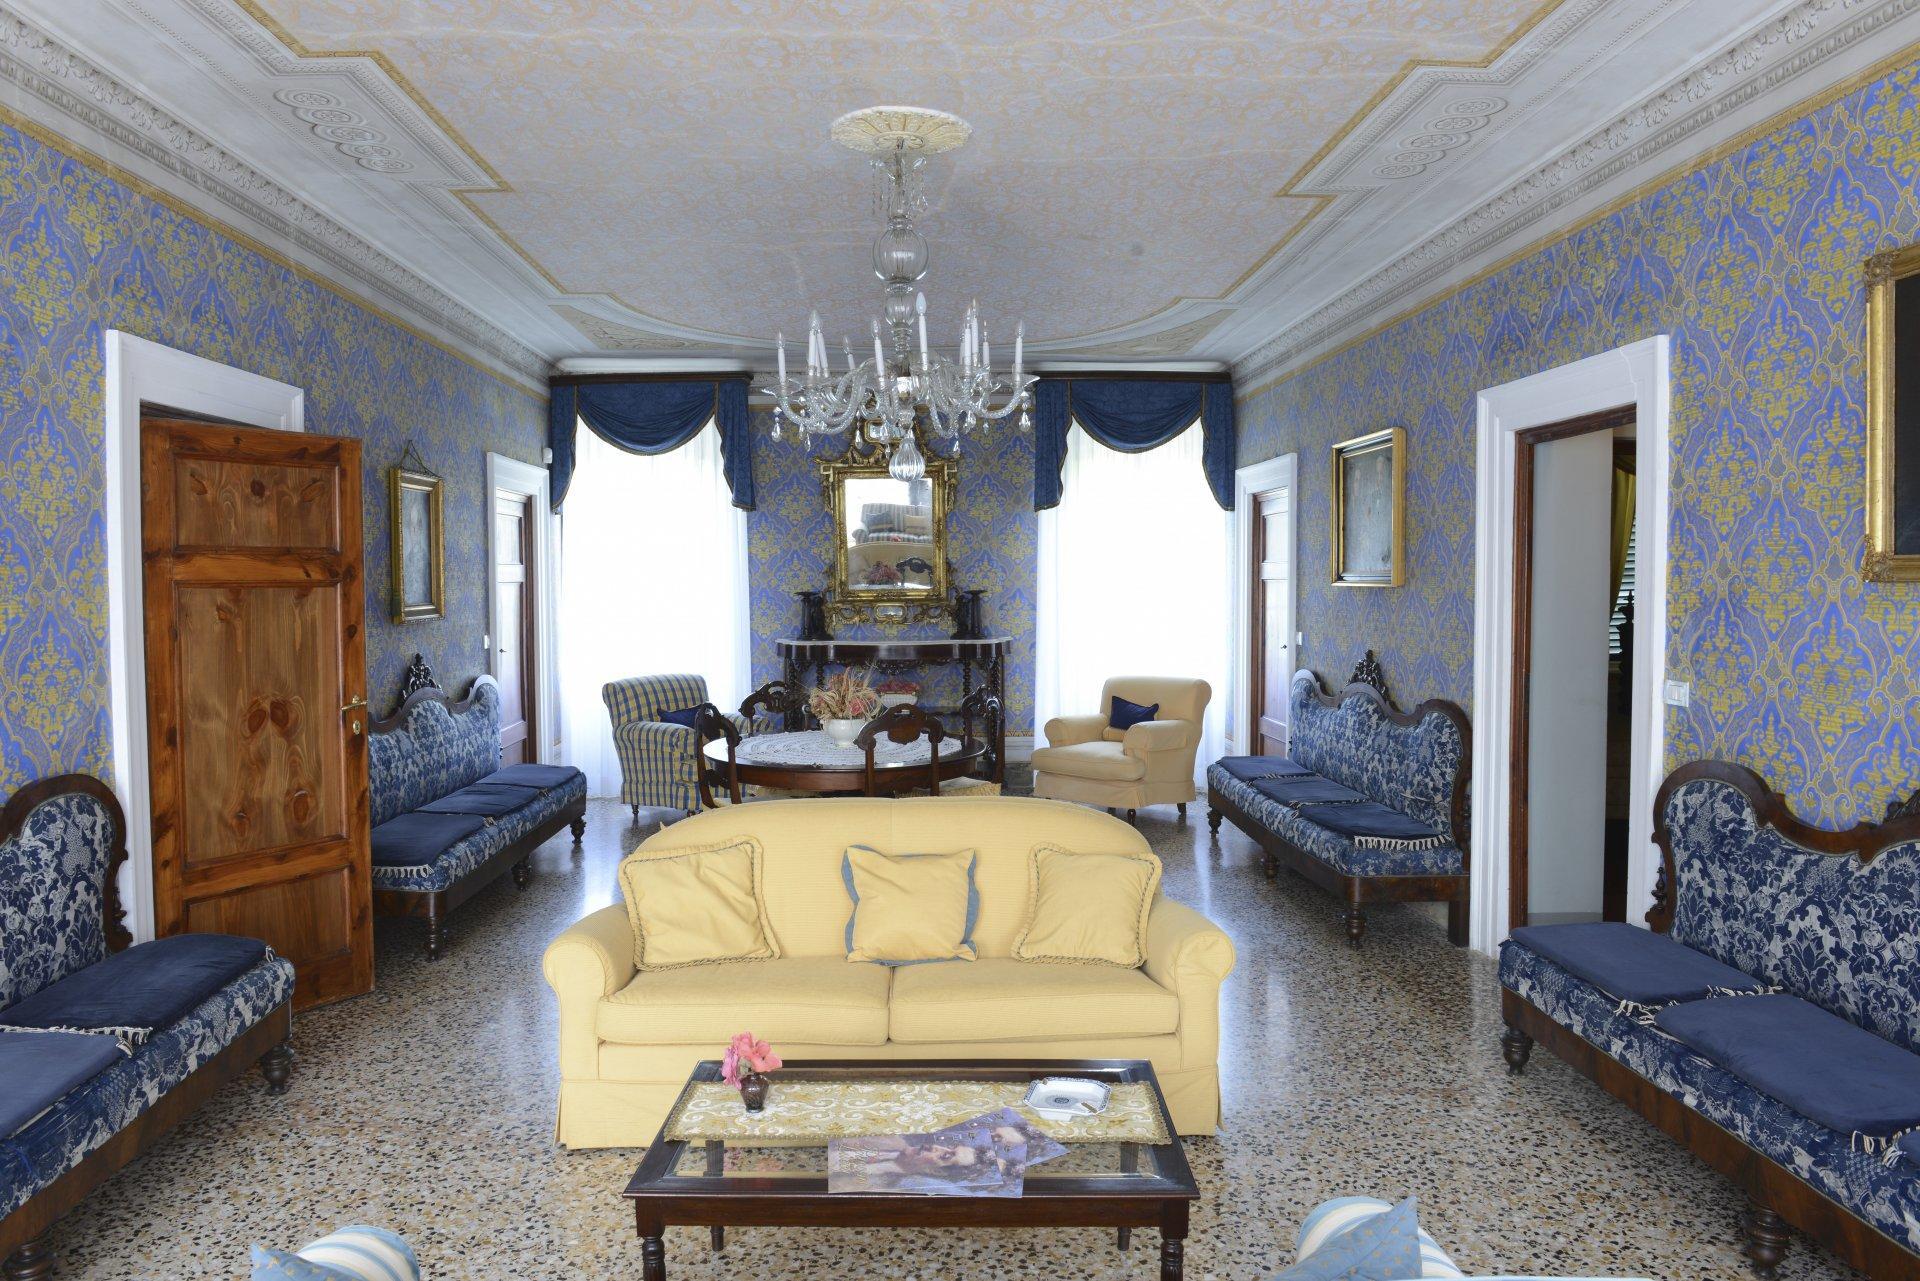 Living Room, Il Maniero, Lucca, Tuscany.